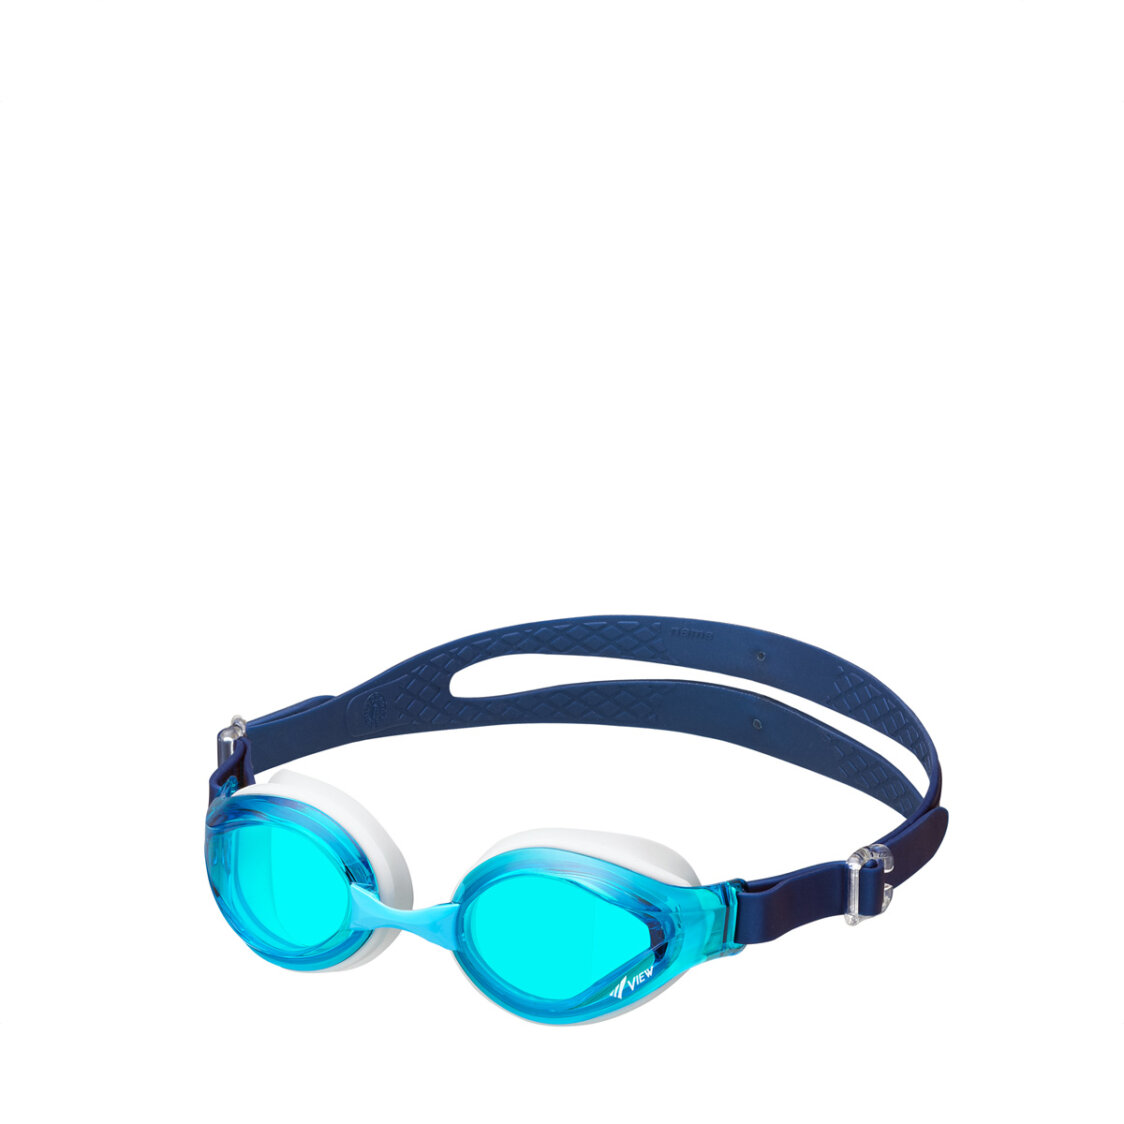 View Junior Goggle 6 To 12 Years Old Aqua Marine AAV760JA